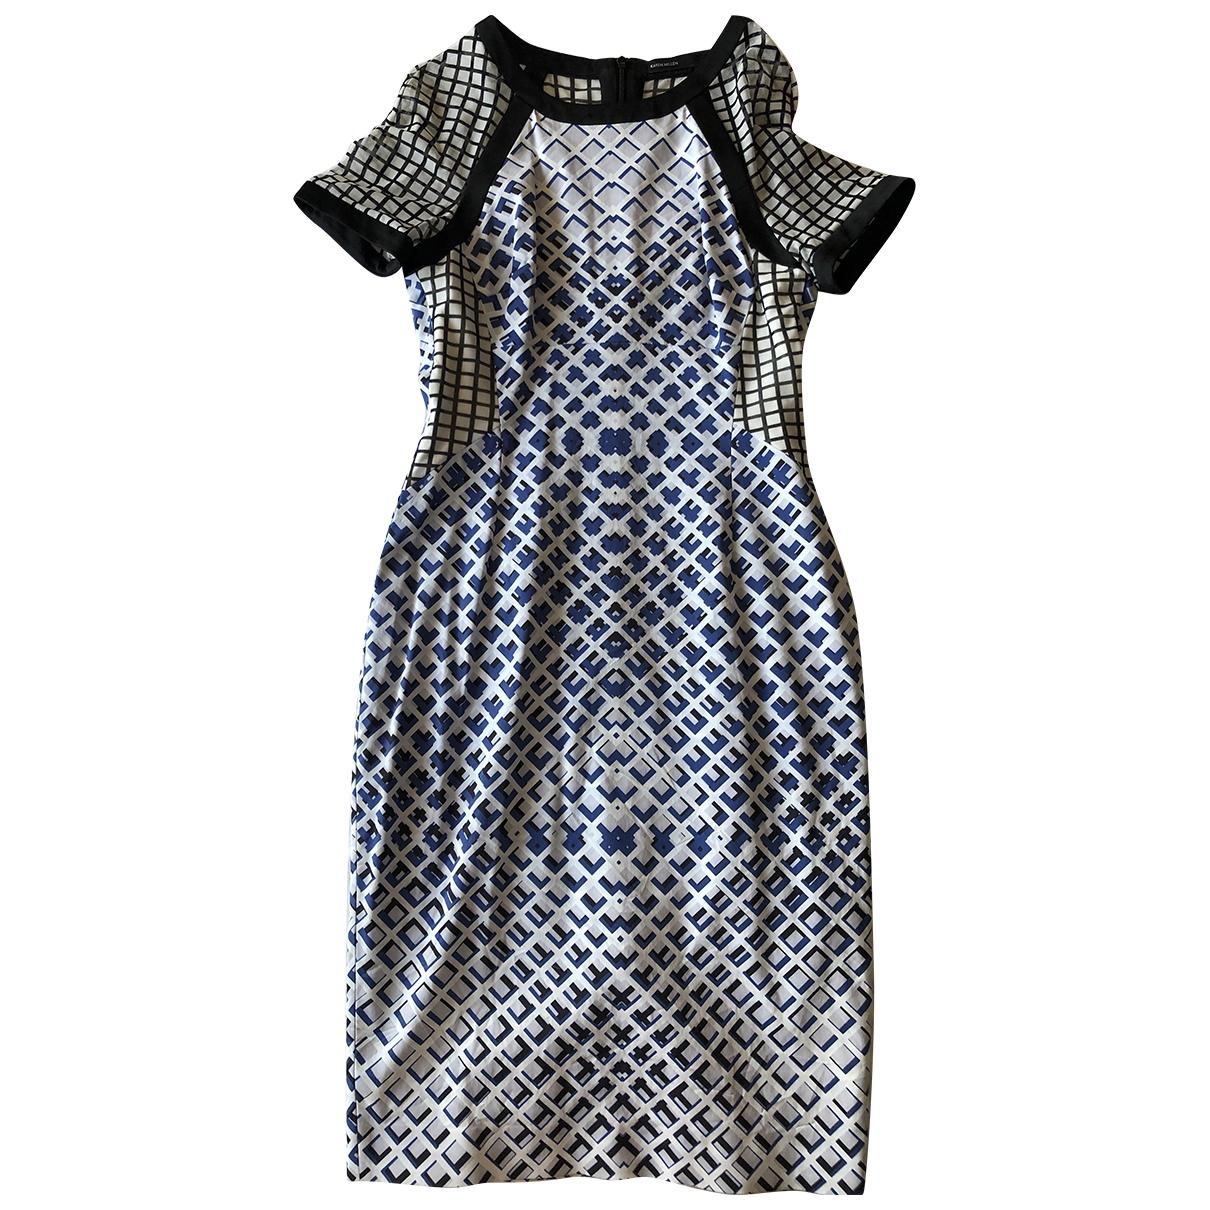 Karen Millen \N Cotton - elasthane dress for Women 8 US